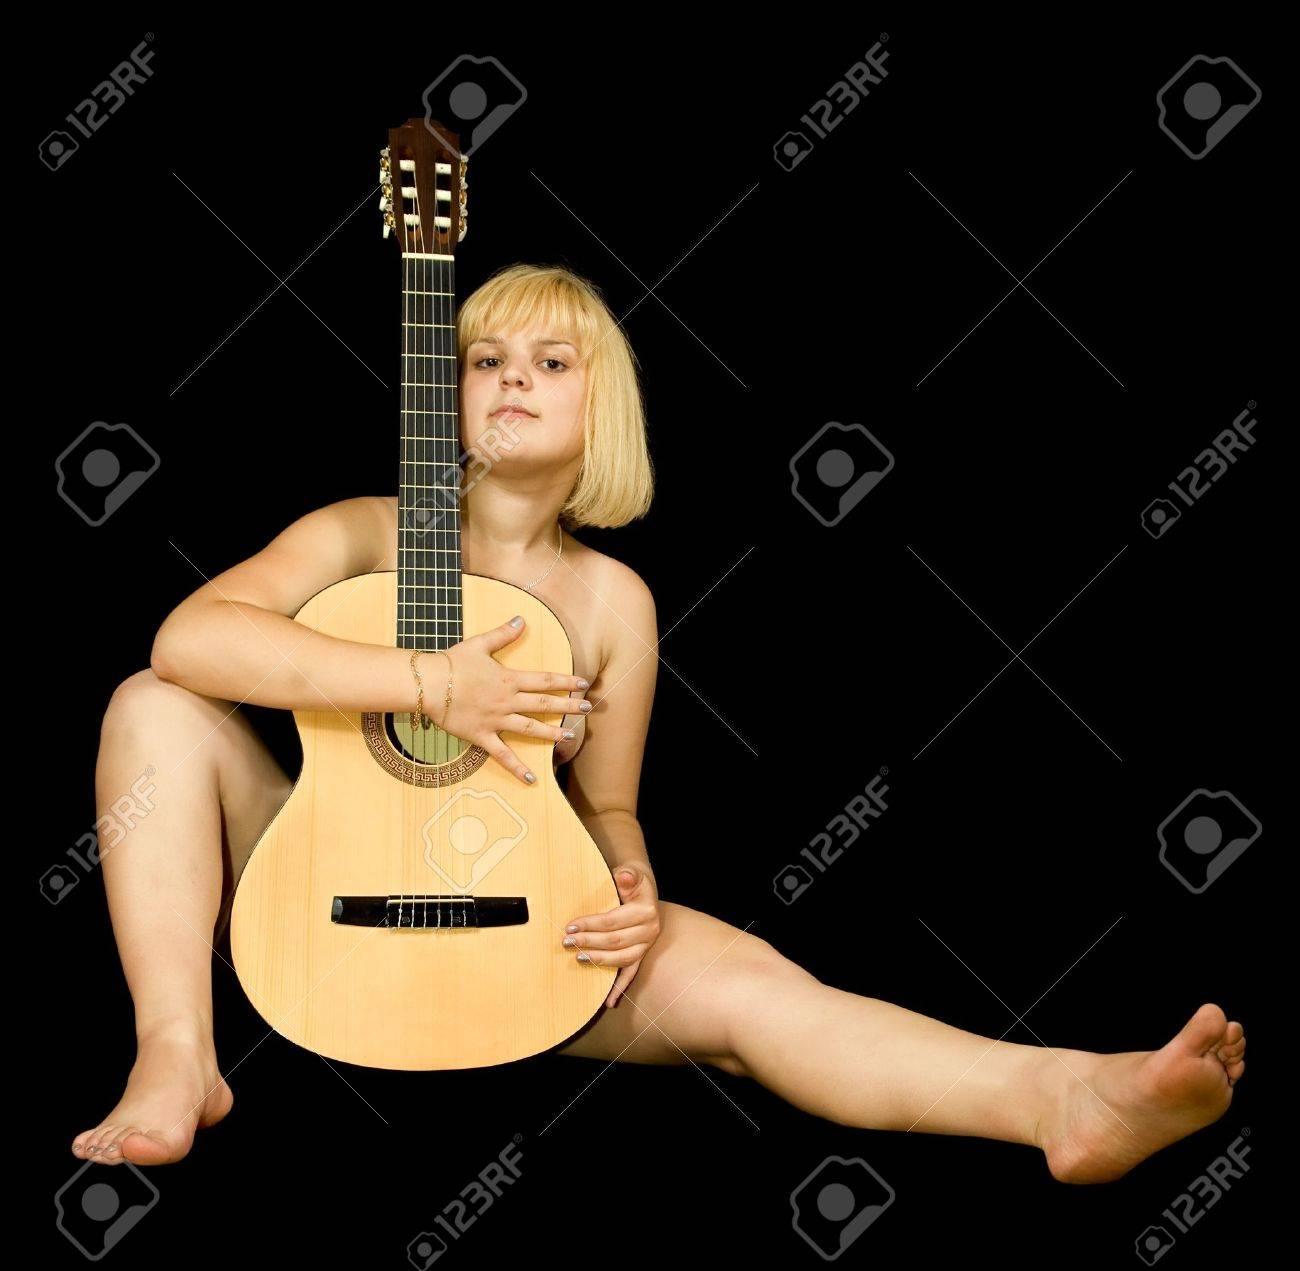 Sexy girls playing guitar